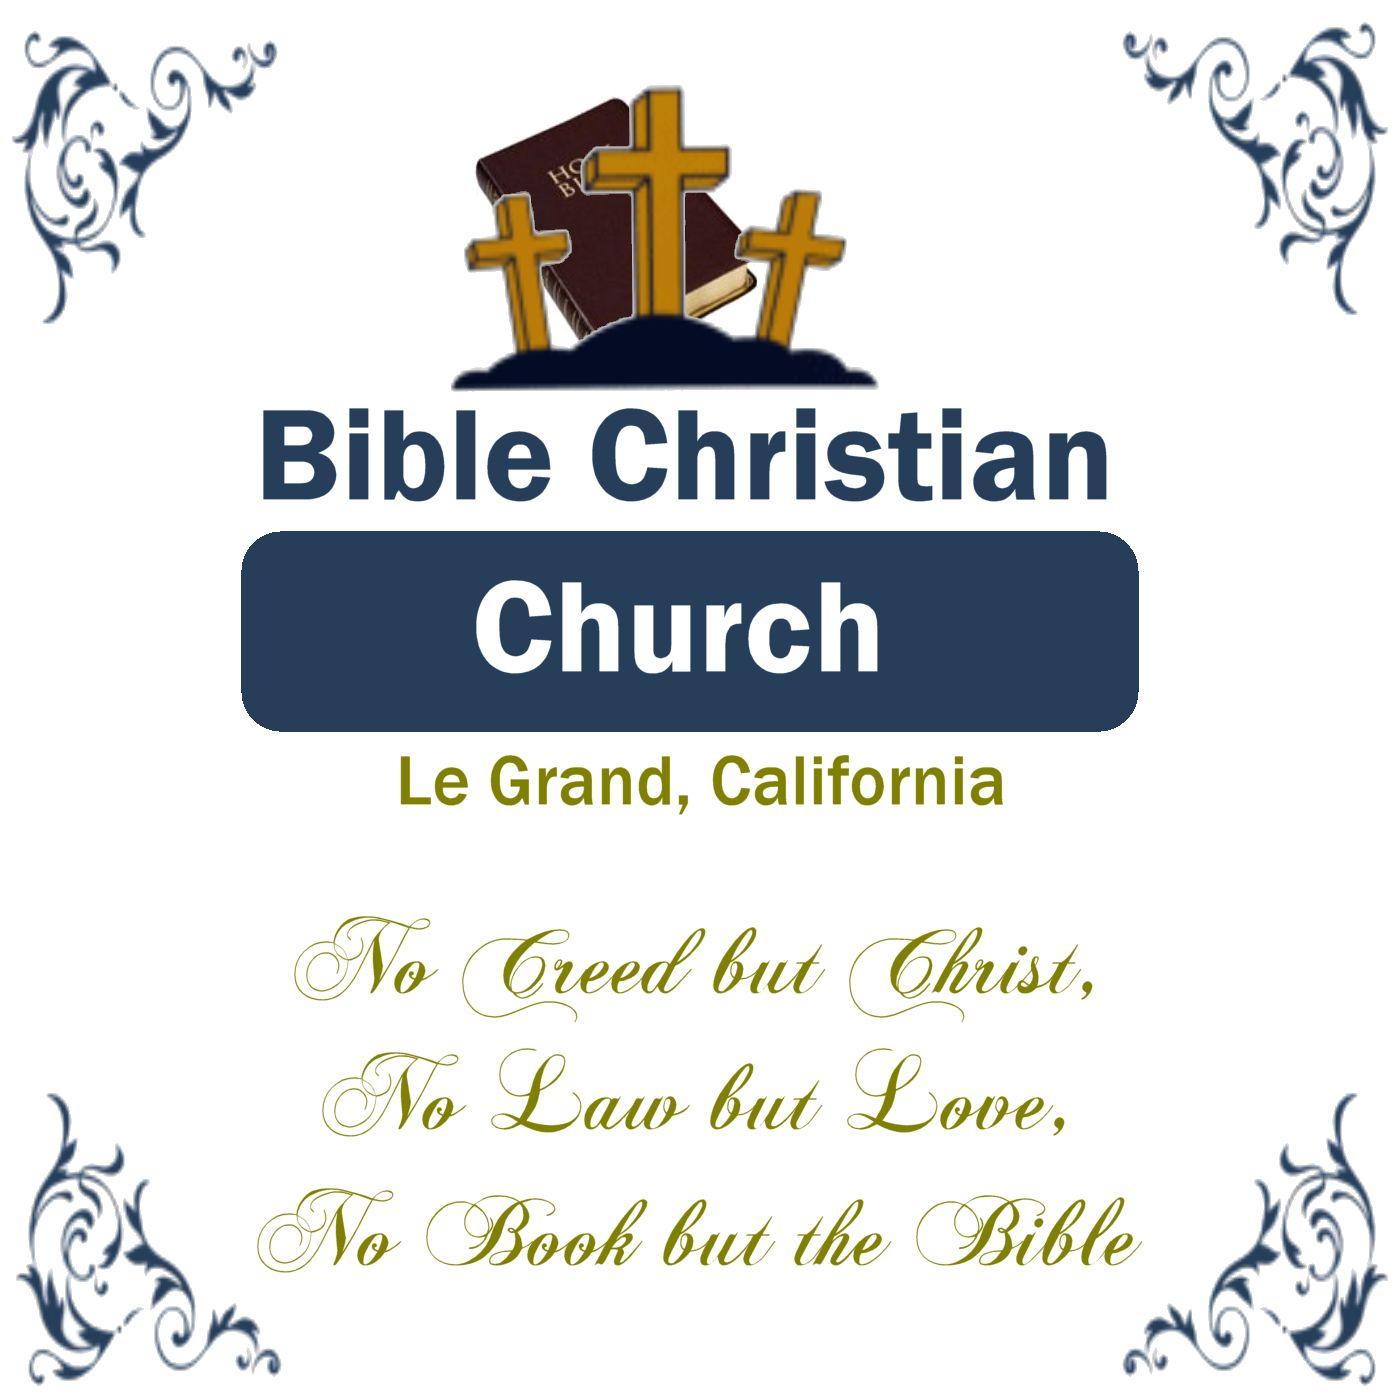 Bible Christian Church